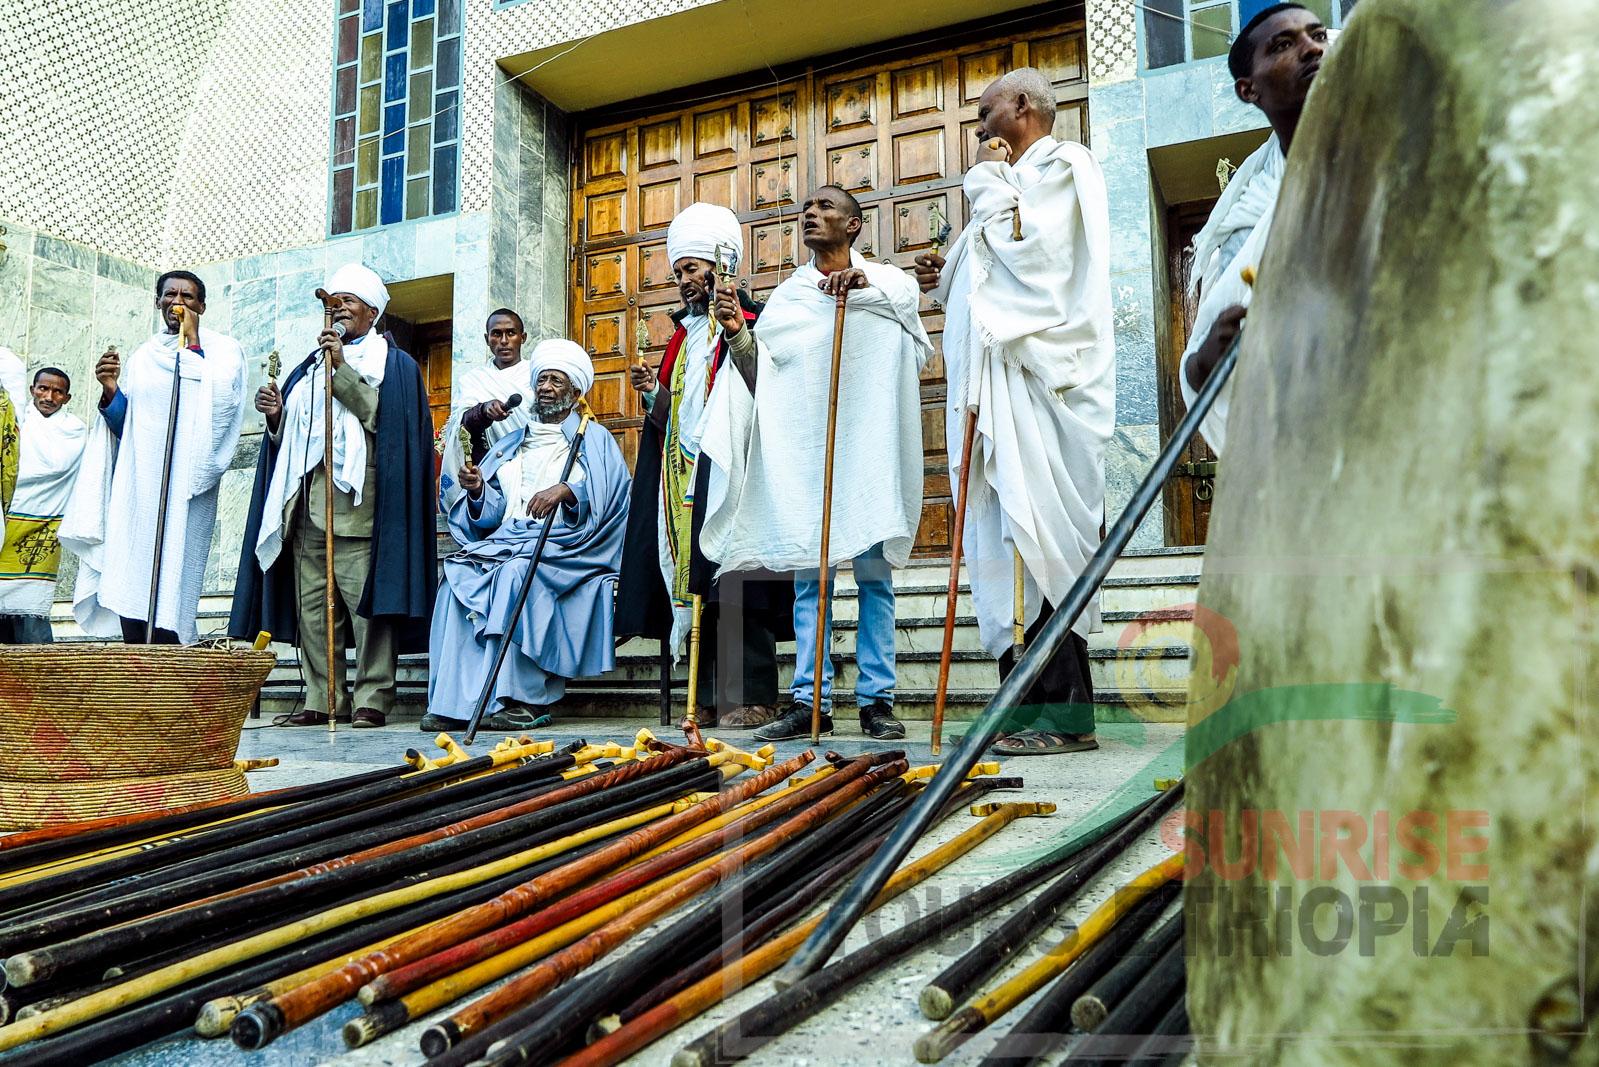 Aksum ortohdox church drums sticks